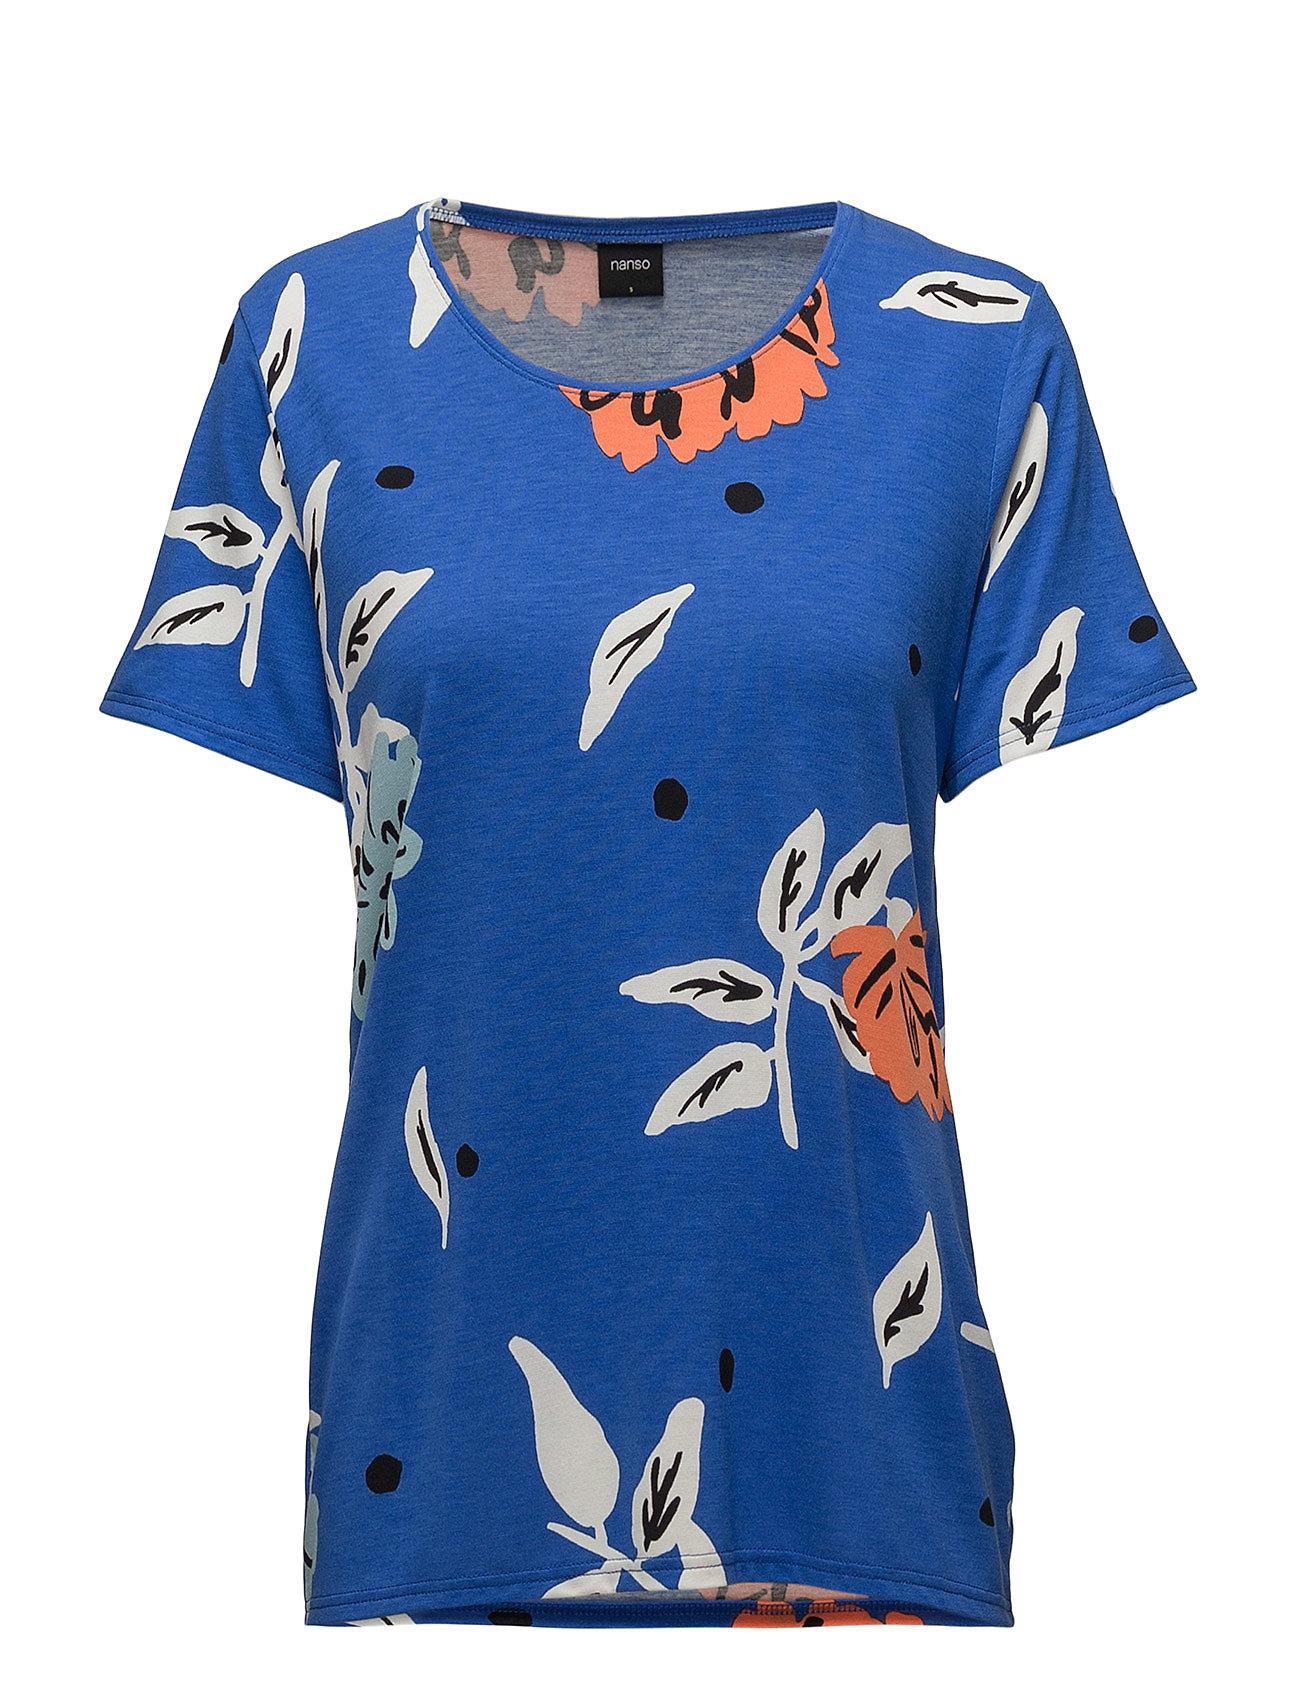 Nanso Ladies shirt, Freesia - BLUE